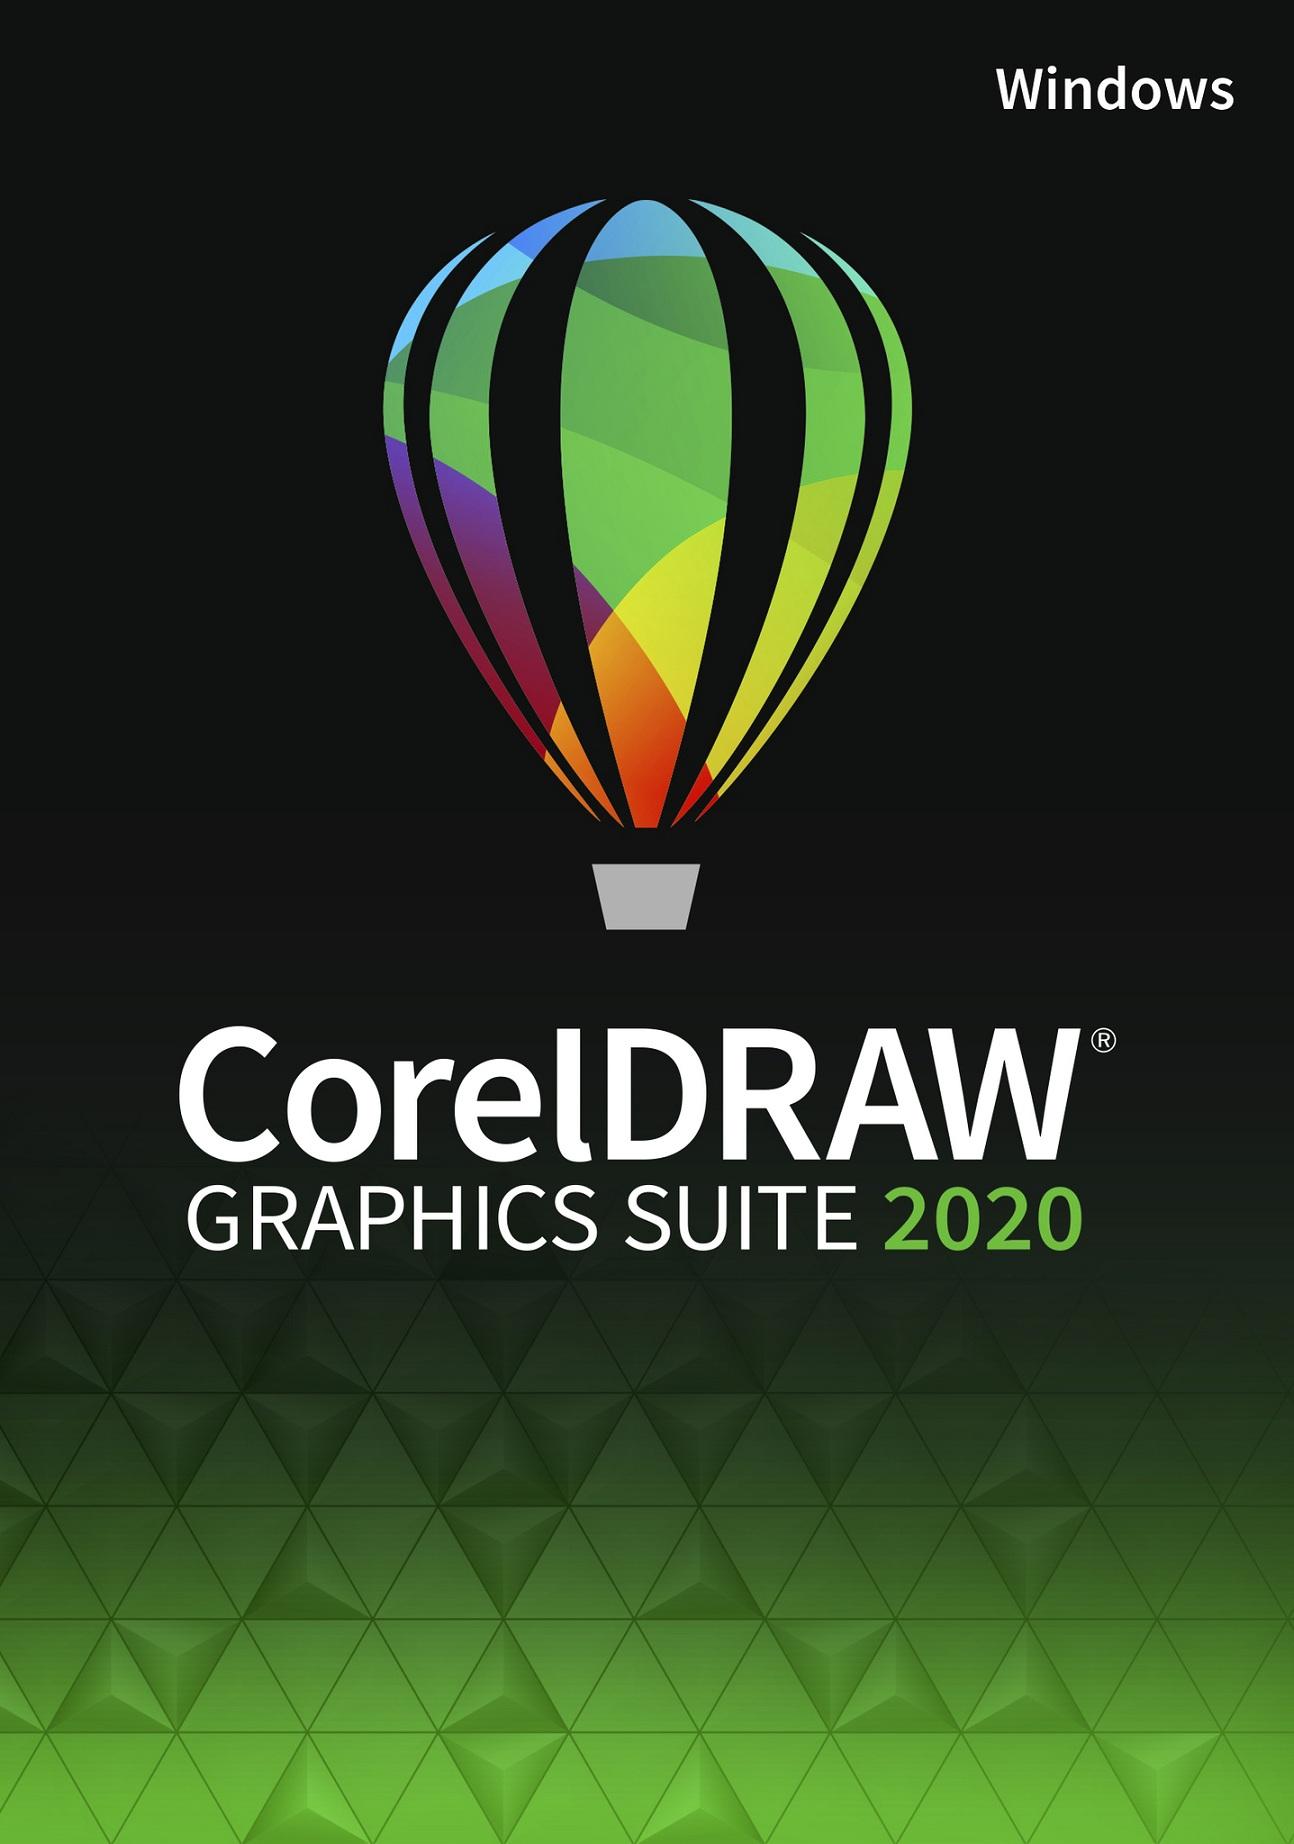 CorelDRAW Graphics Suite 2020 Education License (Windows) (Single User)